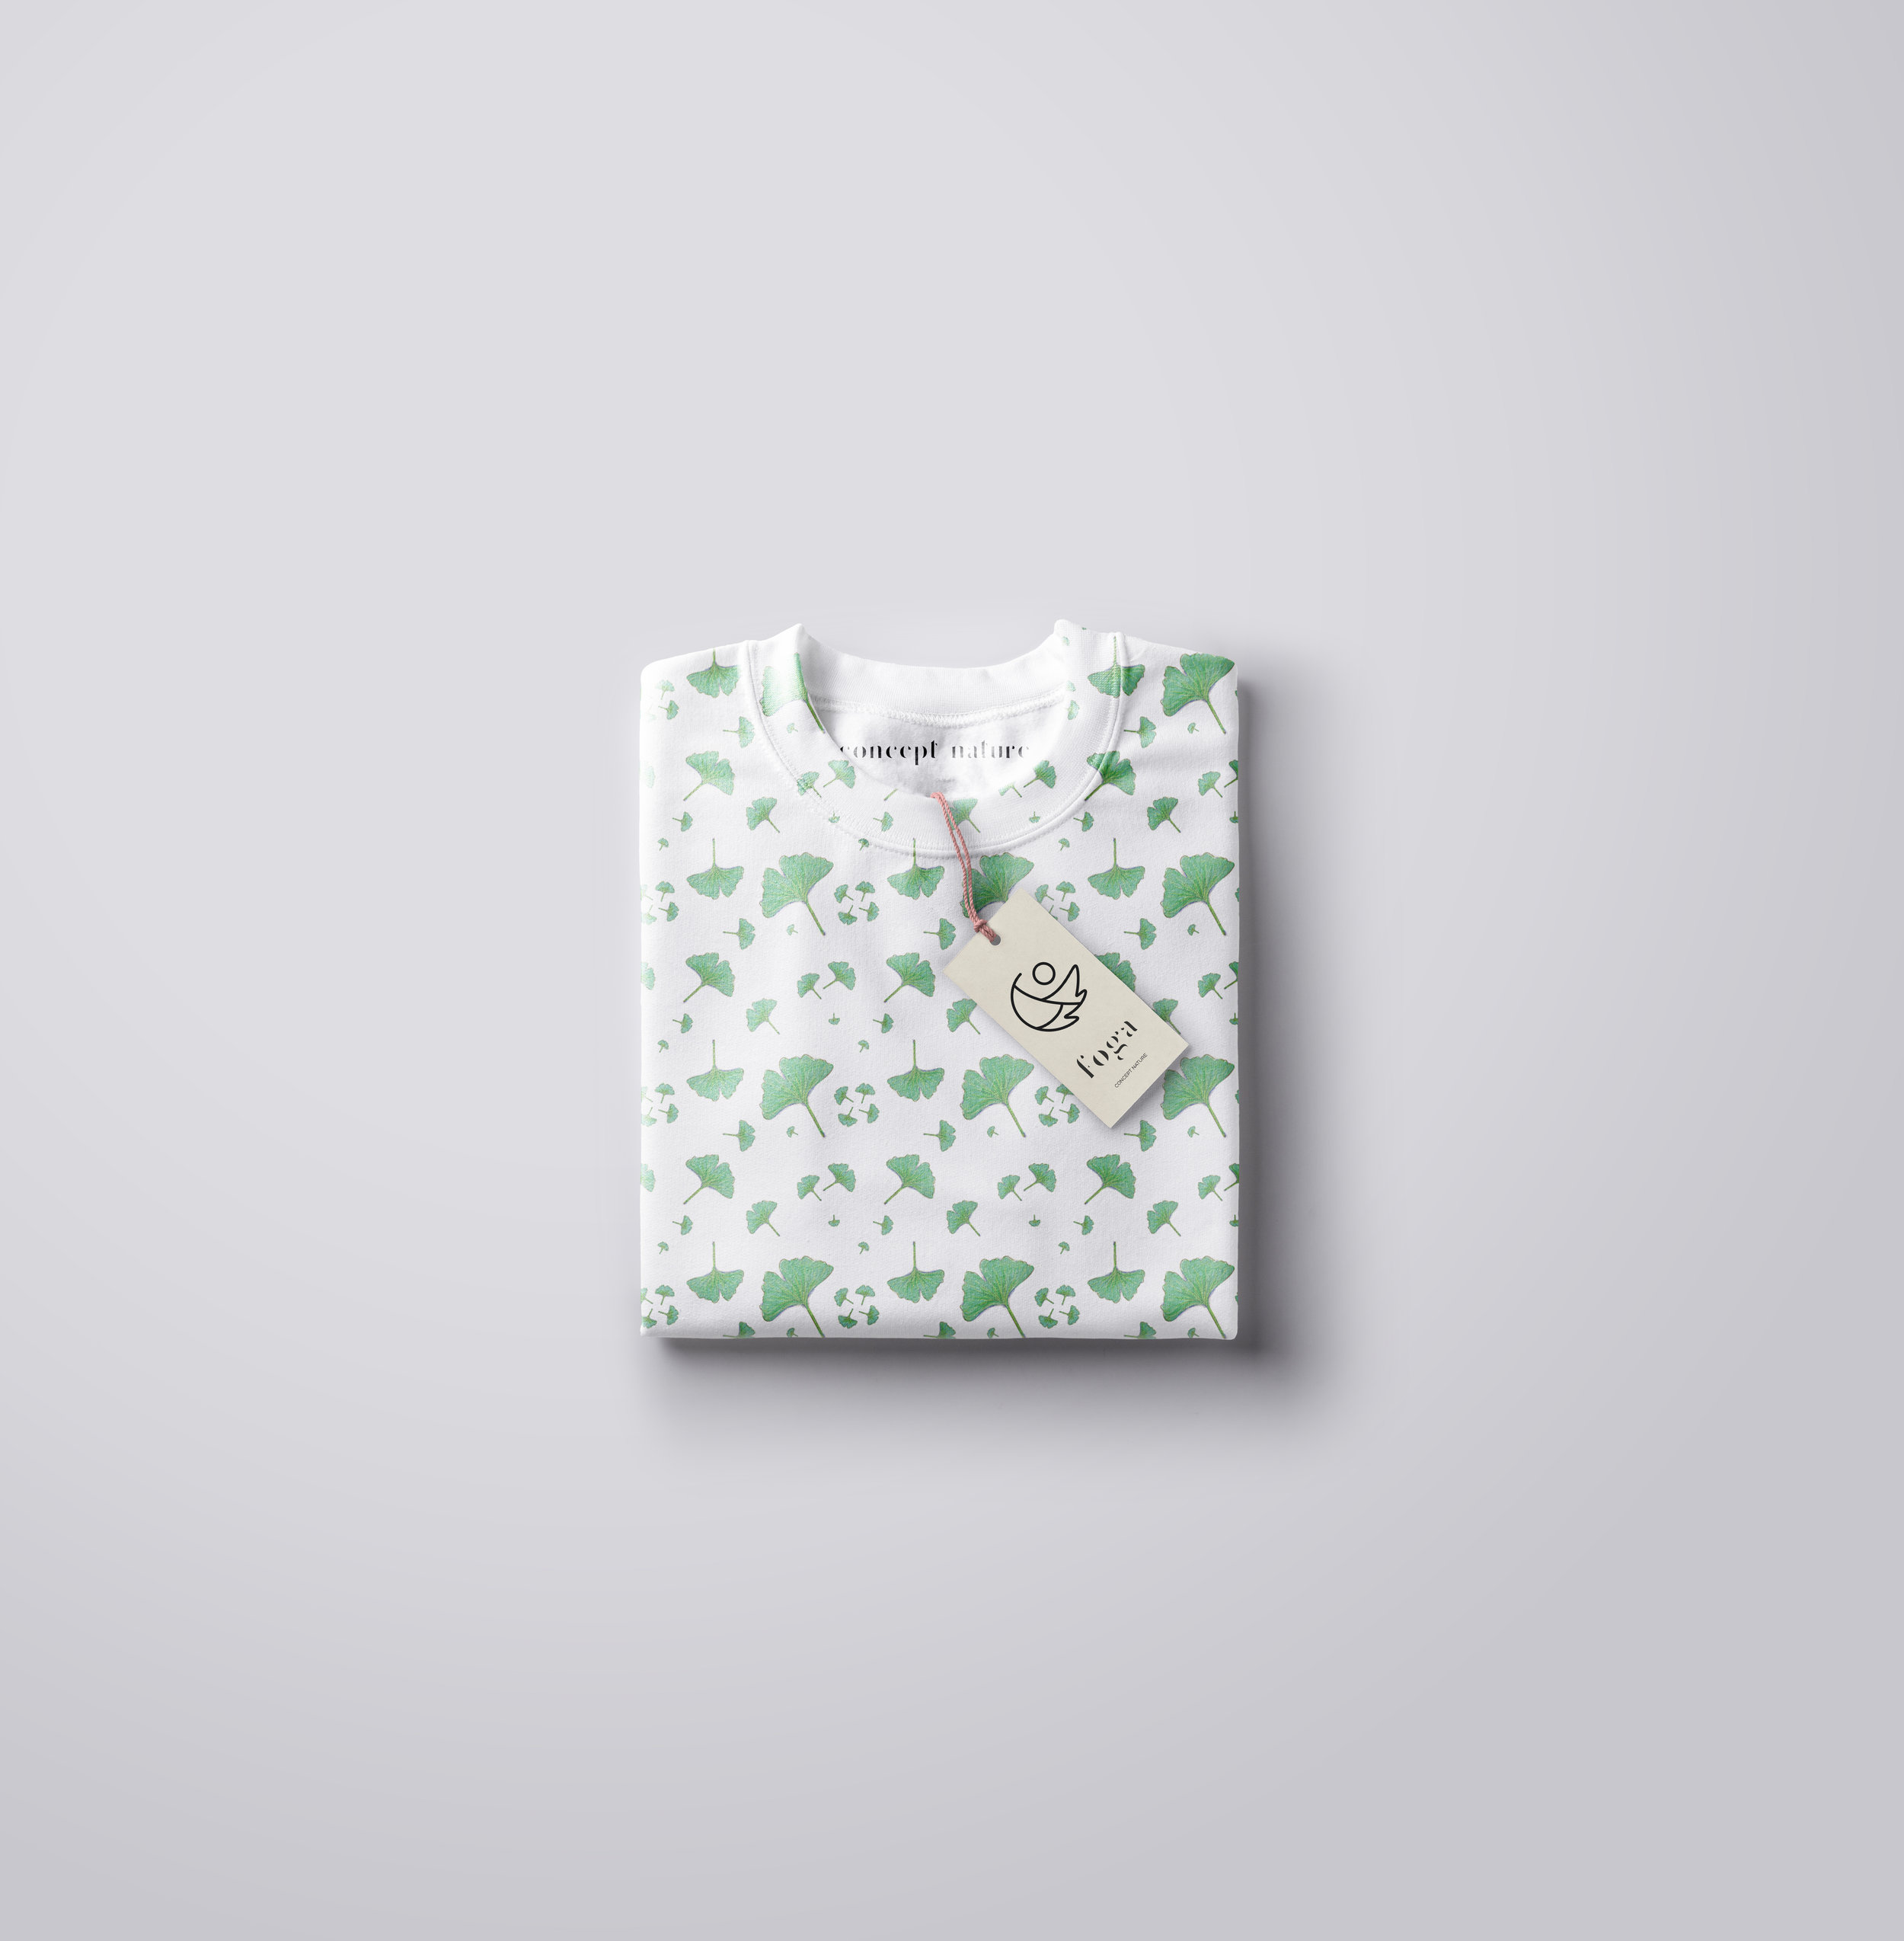 mockup_F_clothes_03_01.jpg